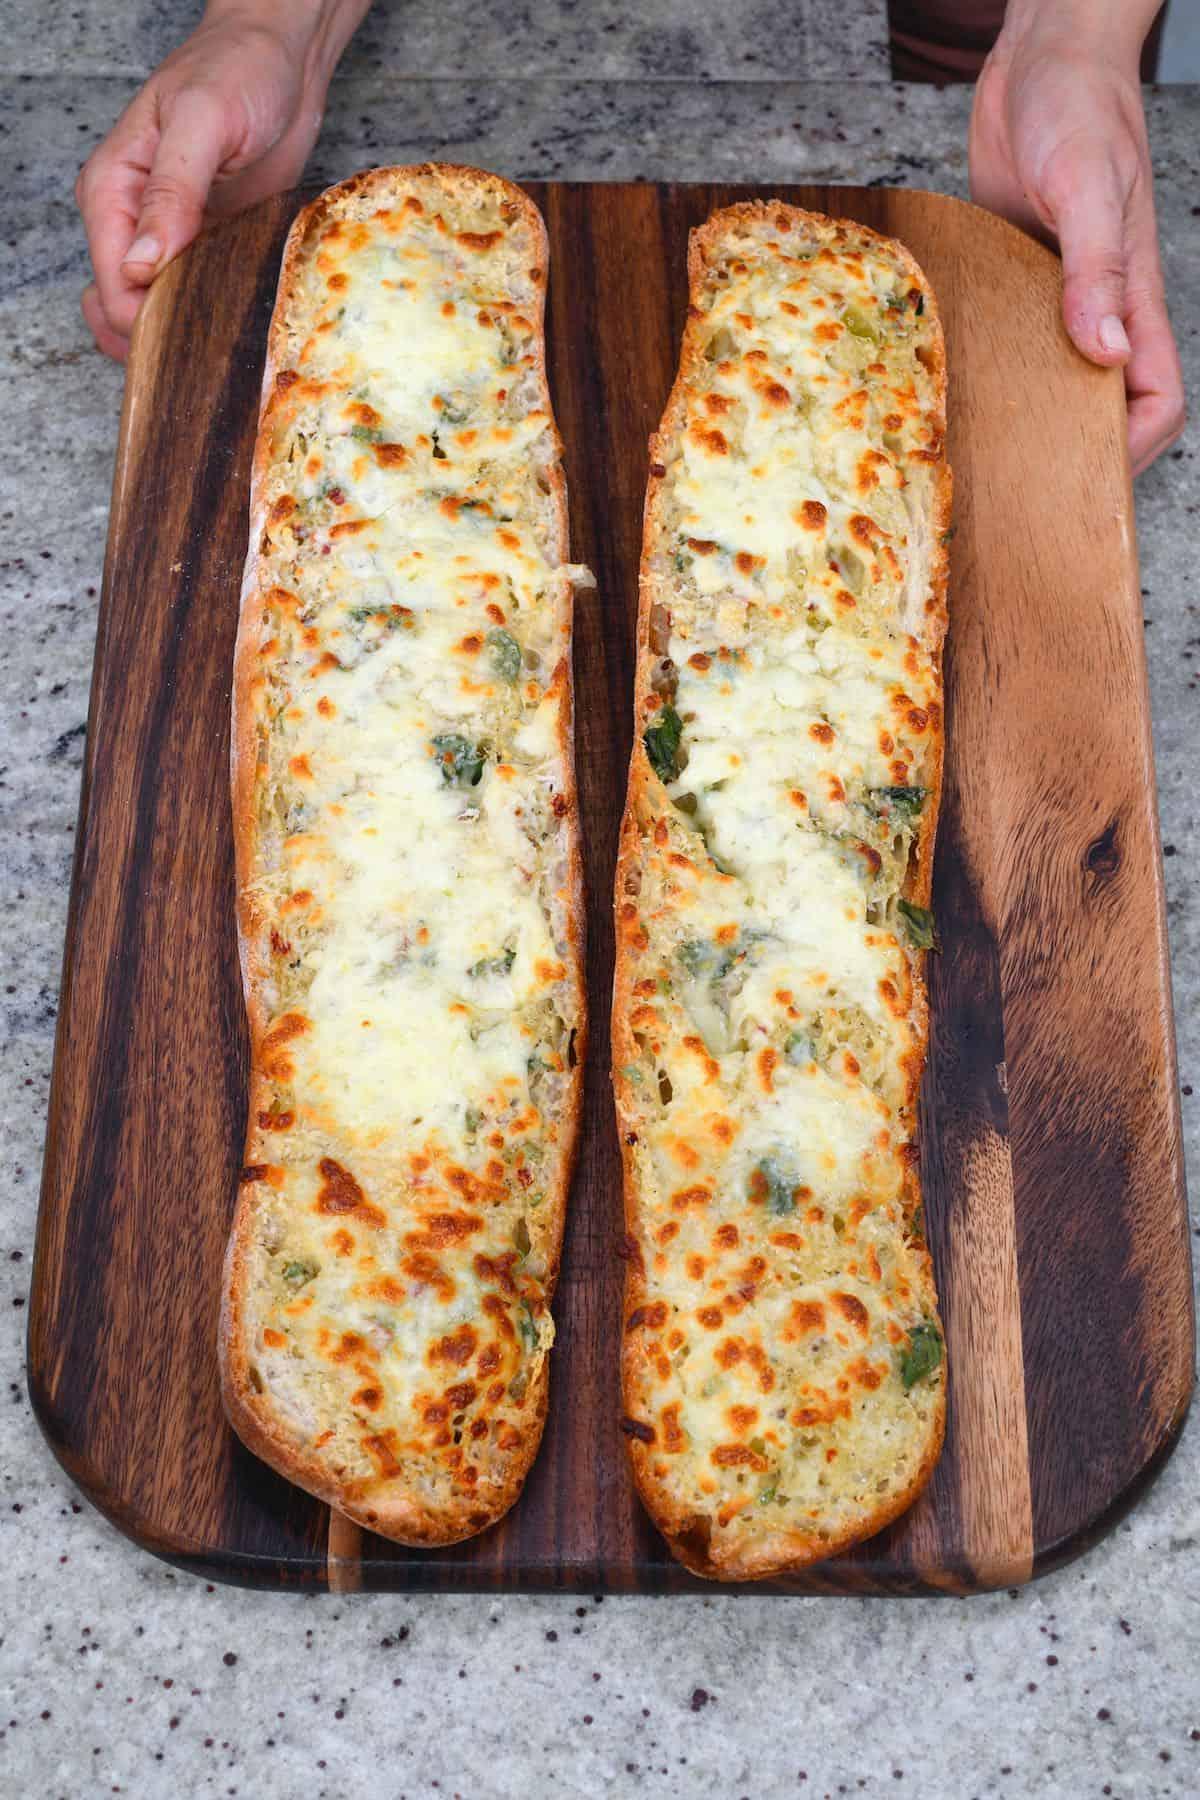 Freshly baked garlic bead with cheese